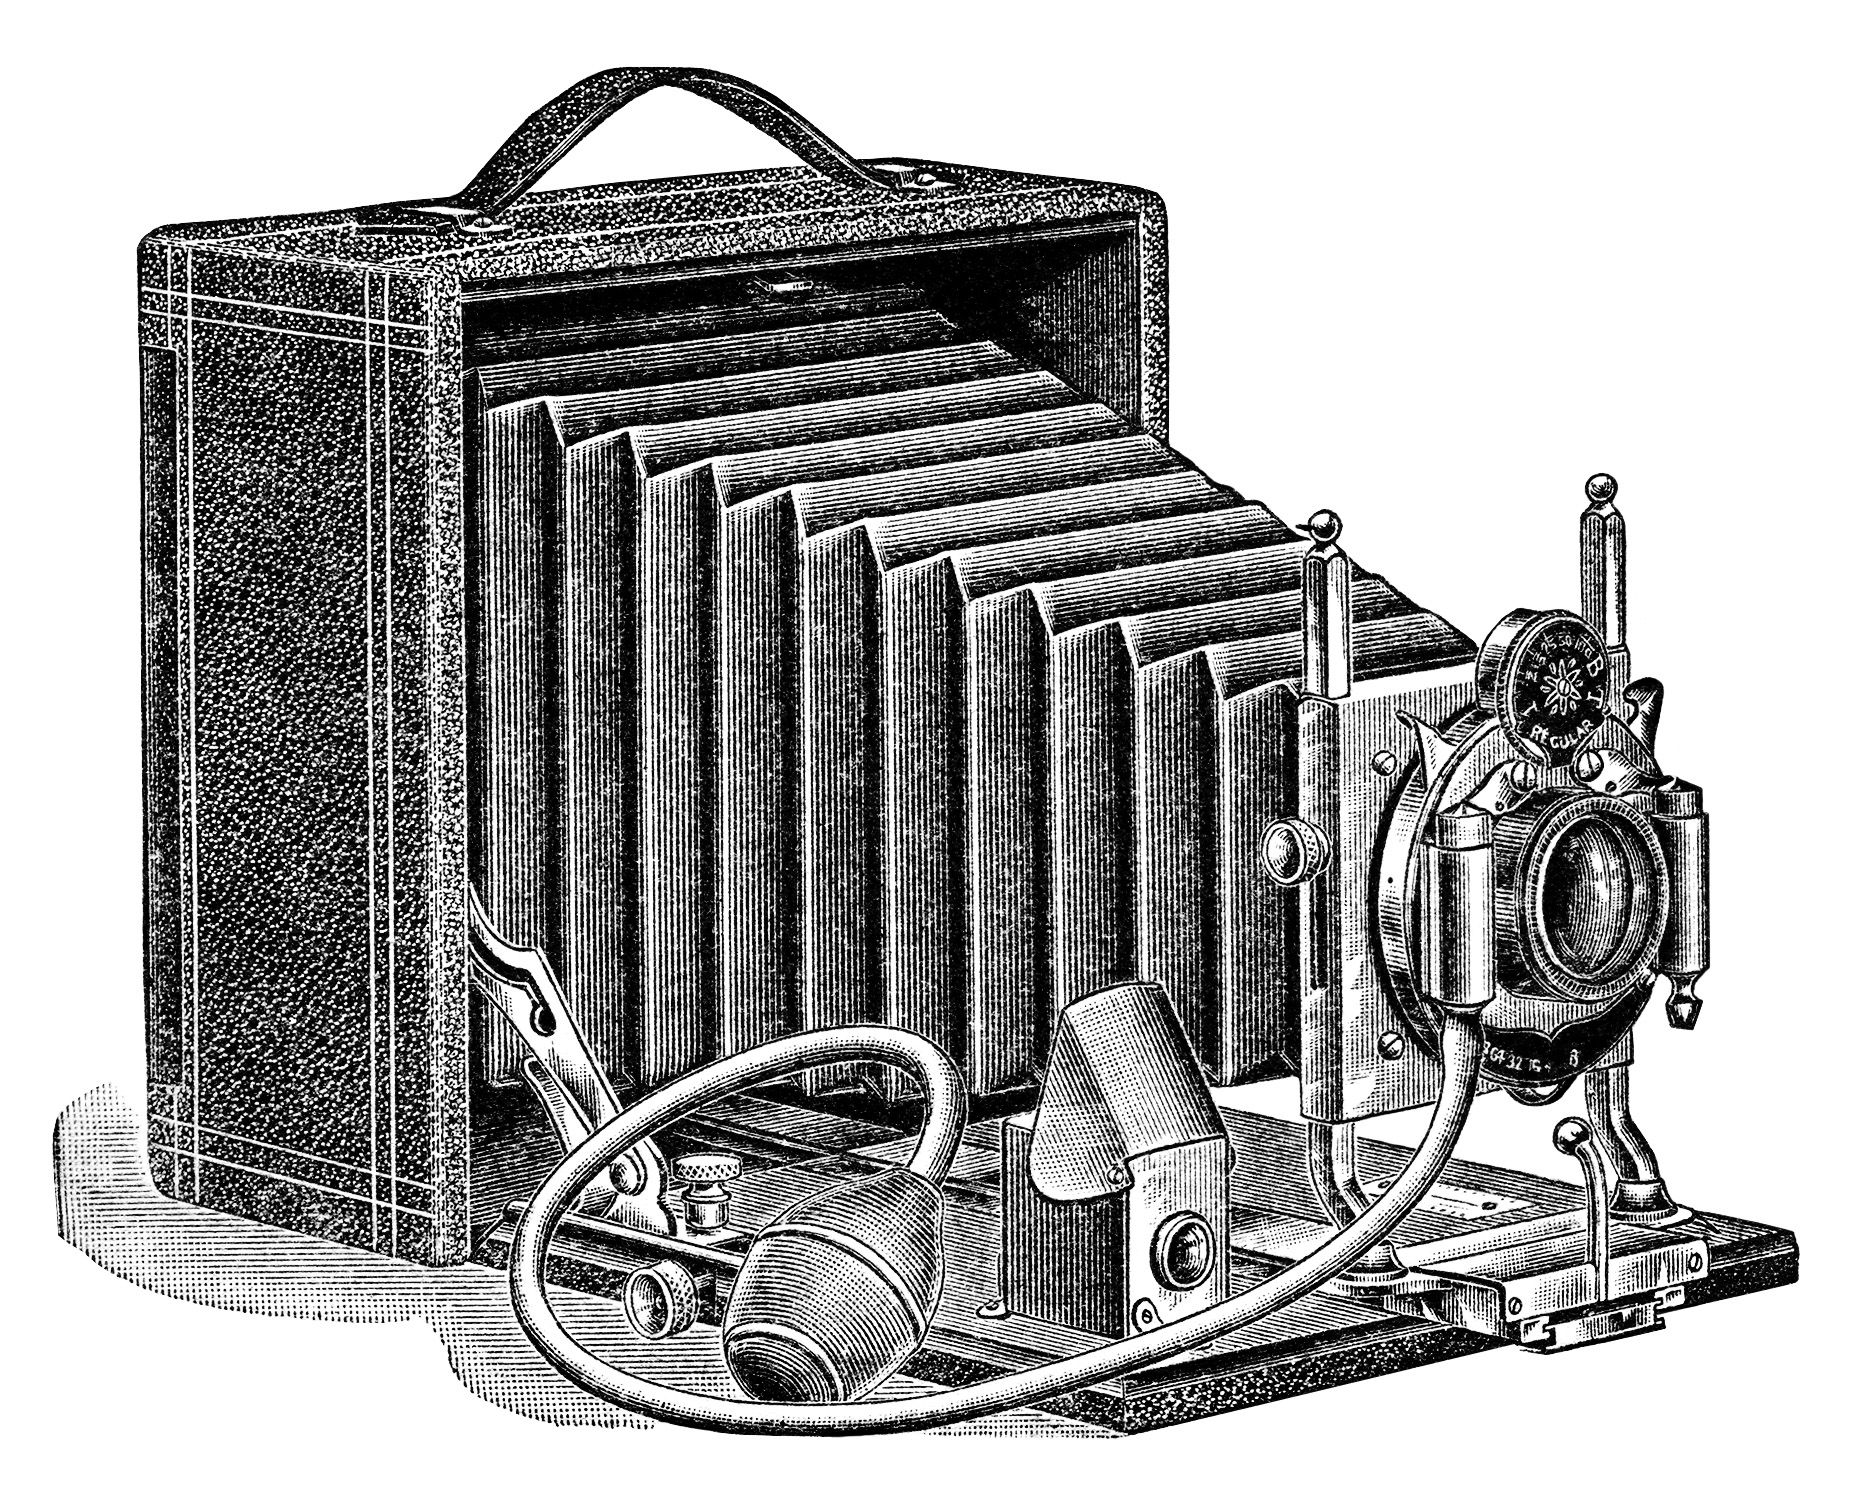 Camera old clipart jpg transparent stock aged paper ephemera, old fashioned camera image, black and white ... jpg transparent stock